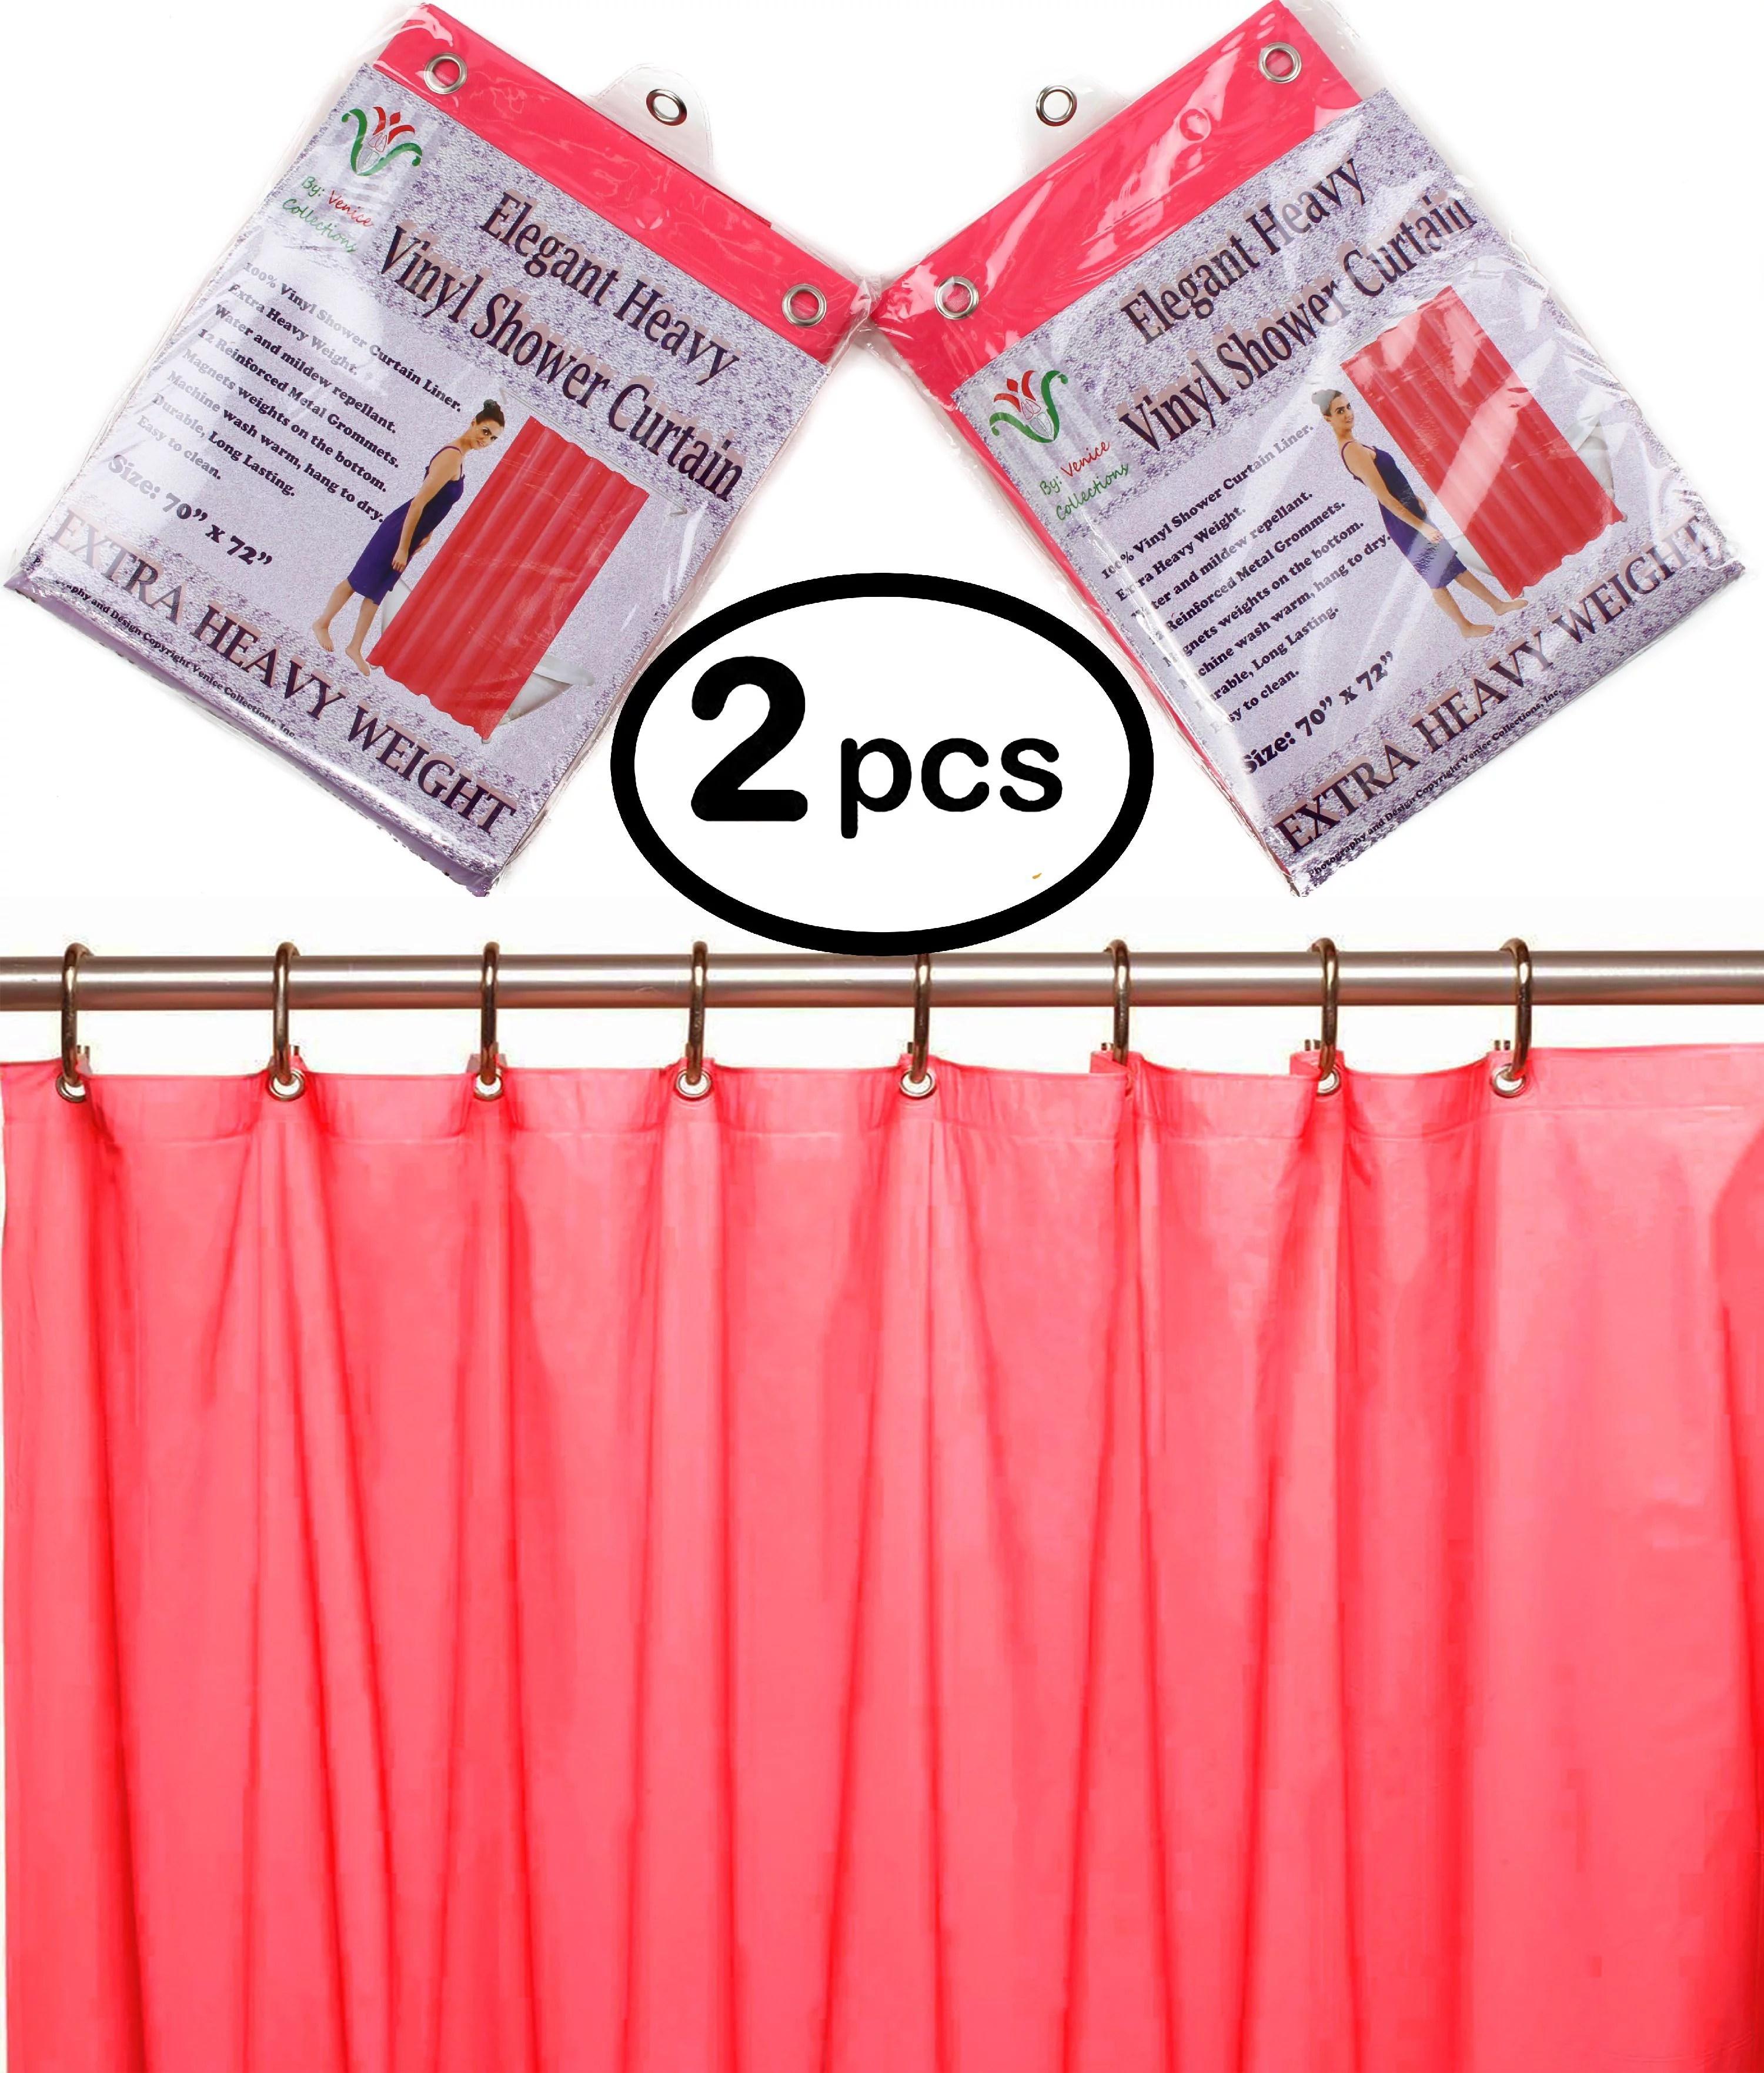 venice elegant home heavy duty vinyl shower curtain liner with 12 metal grommets 2 pack bright pink walmart com walmart com